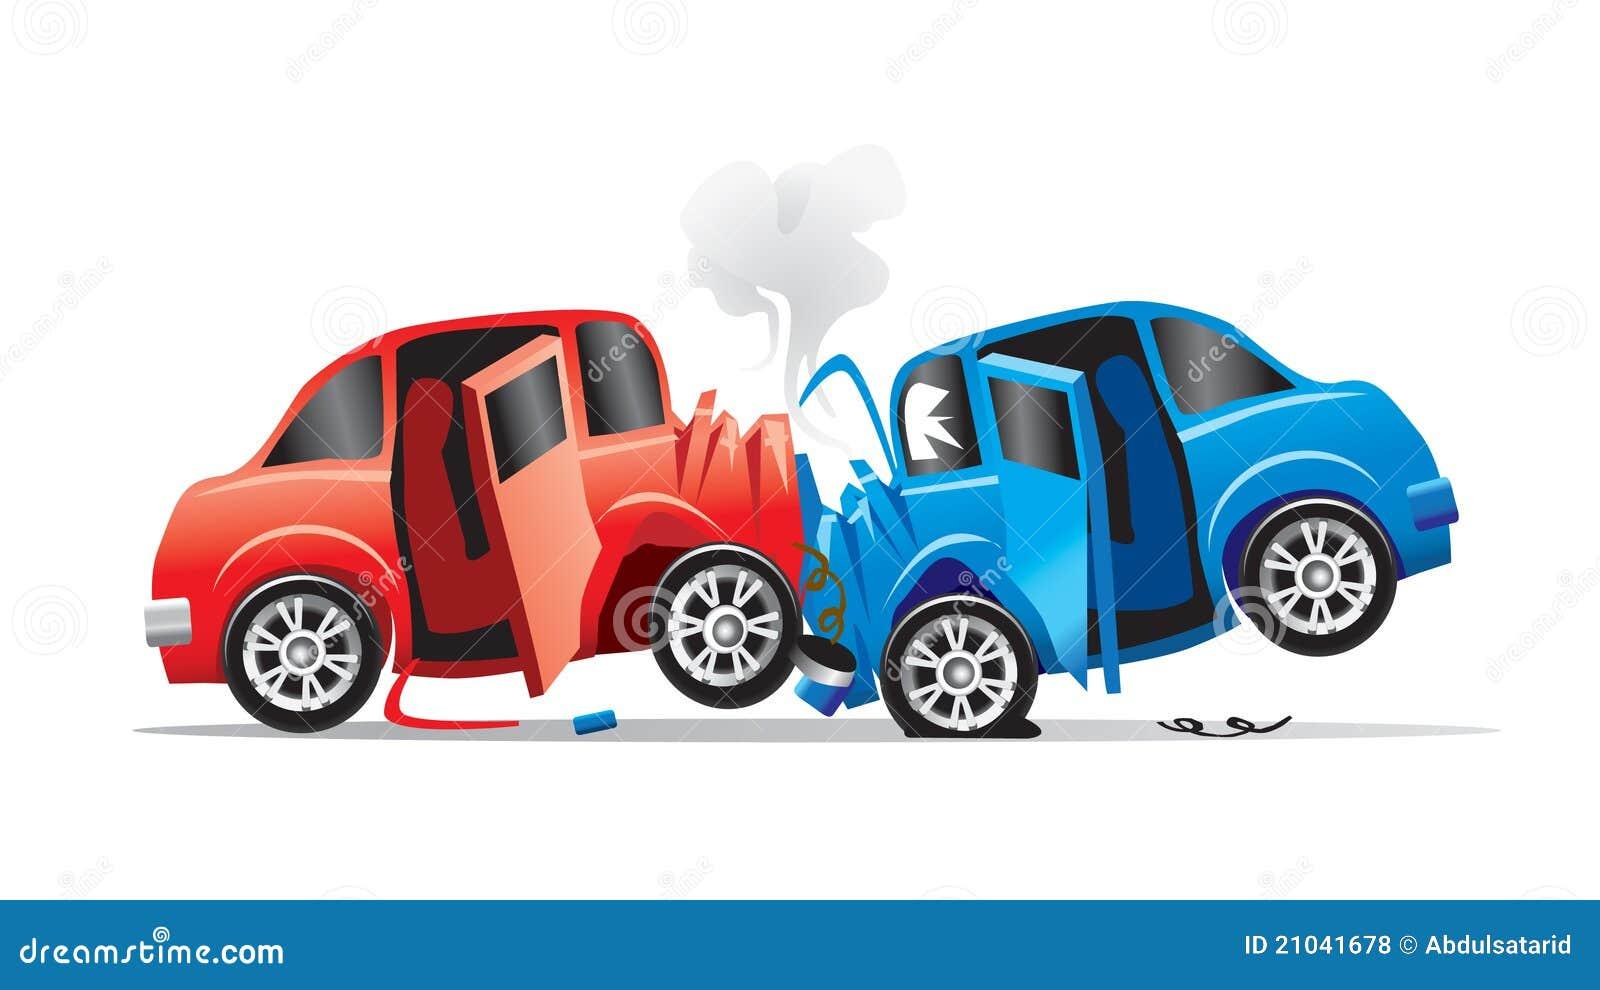 Moving States Car Insurance